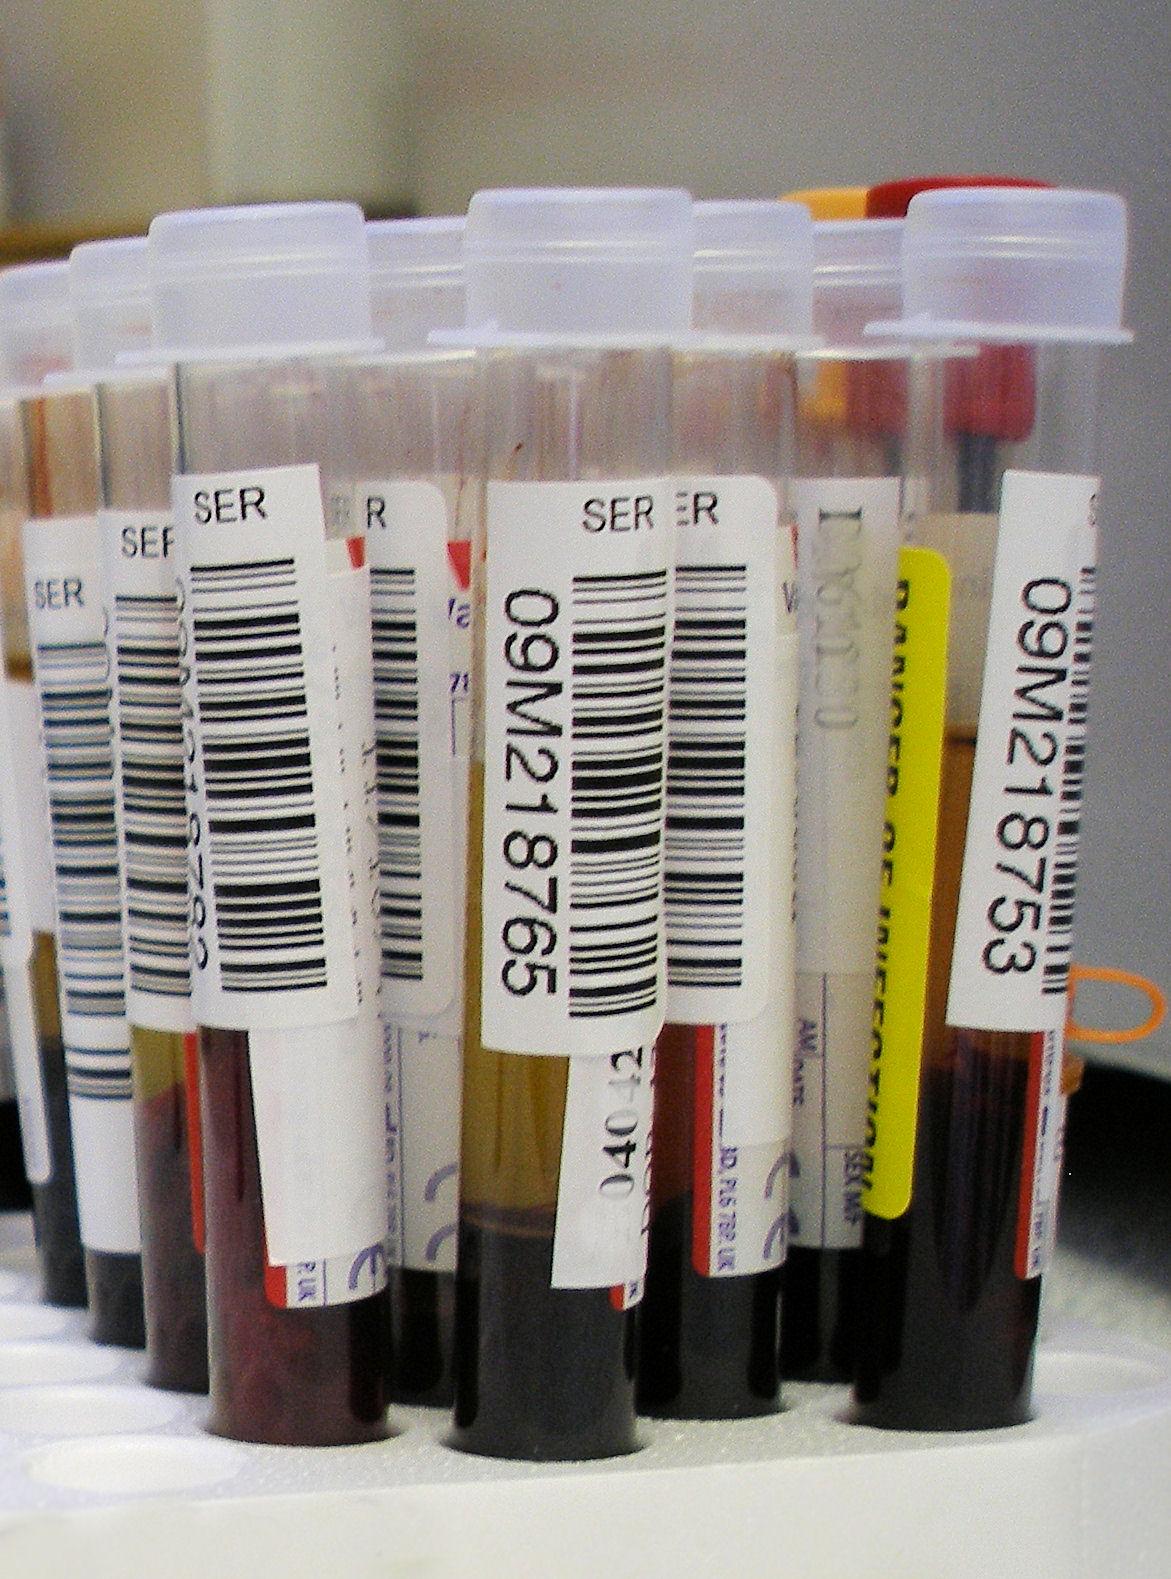 Monospot Test (Heterofil Antikor) Nedir?